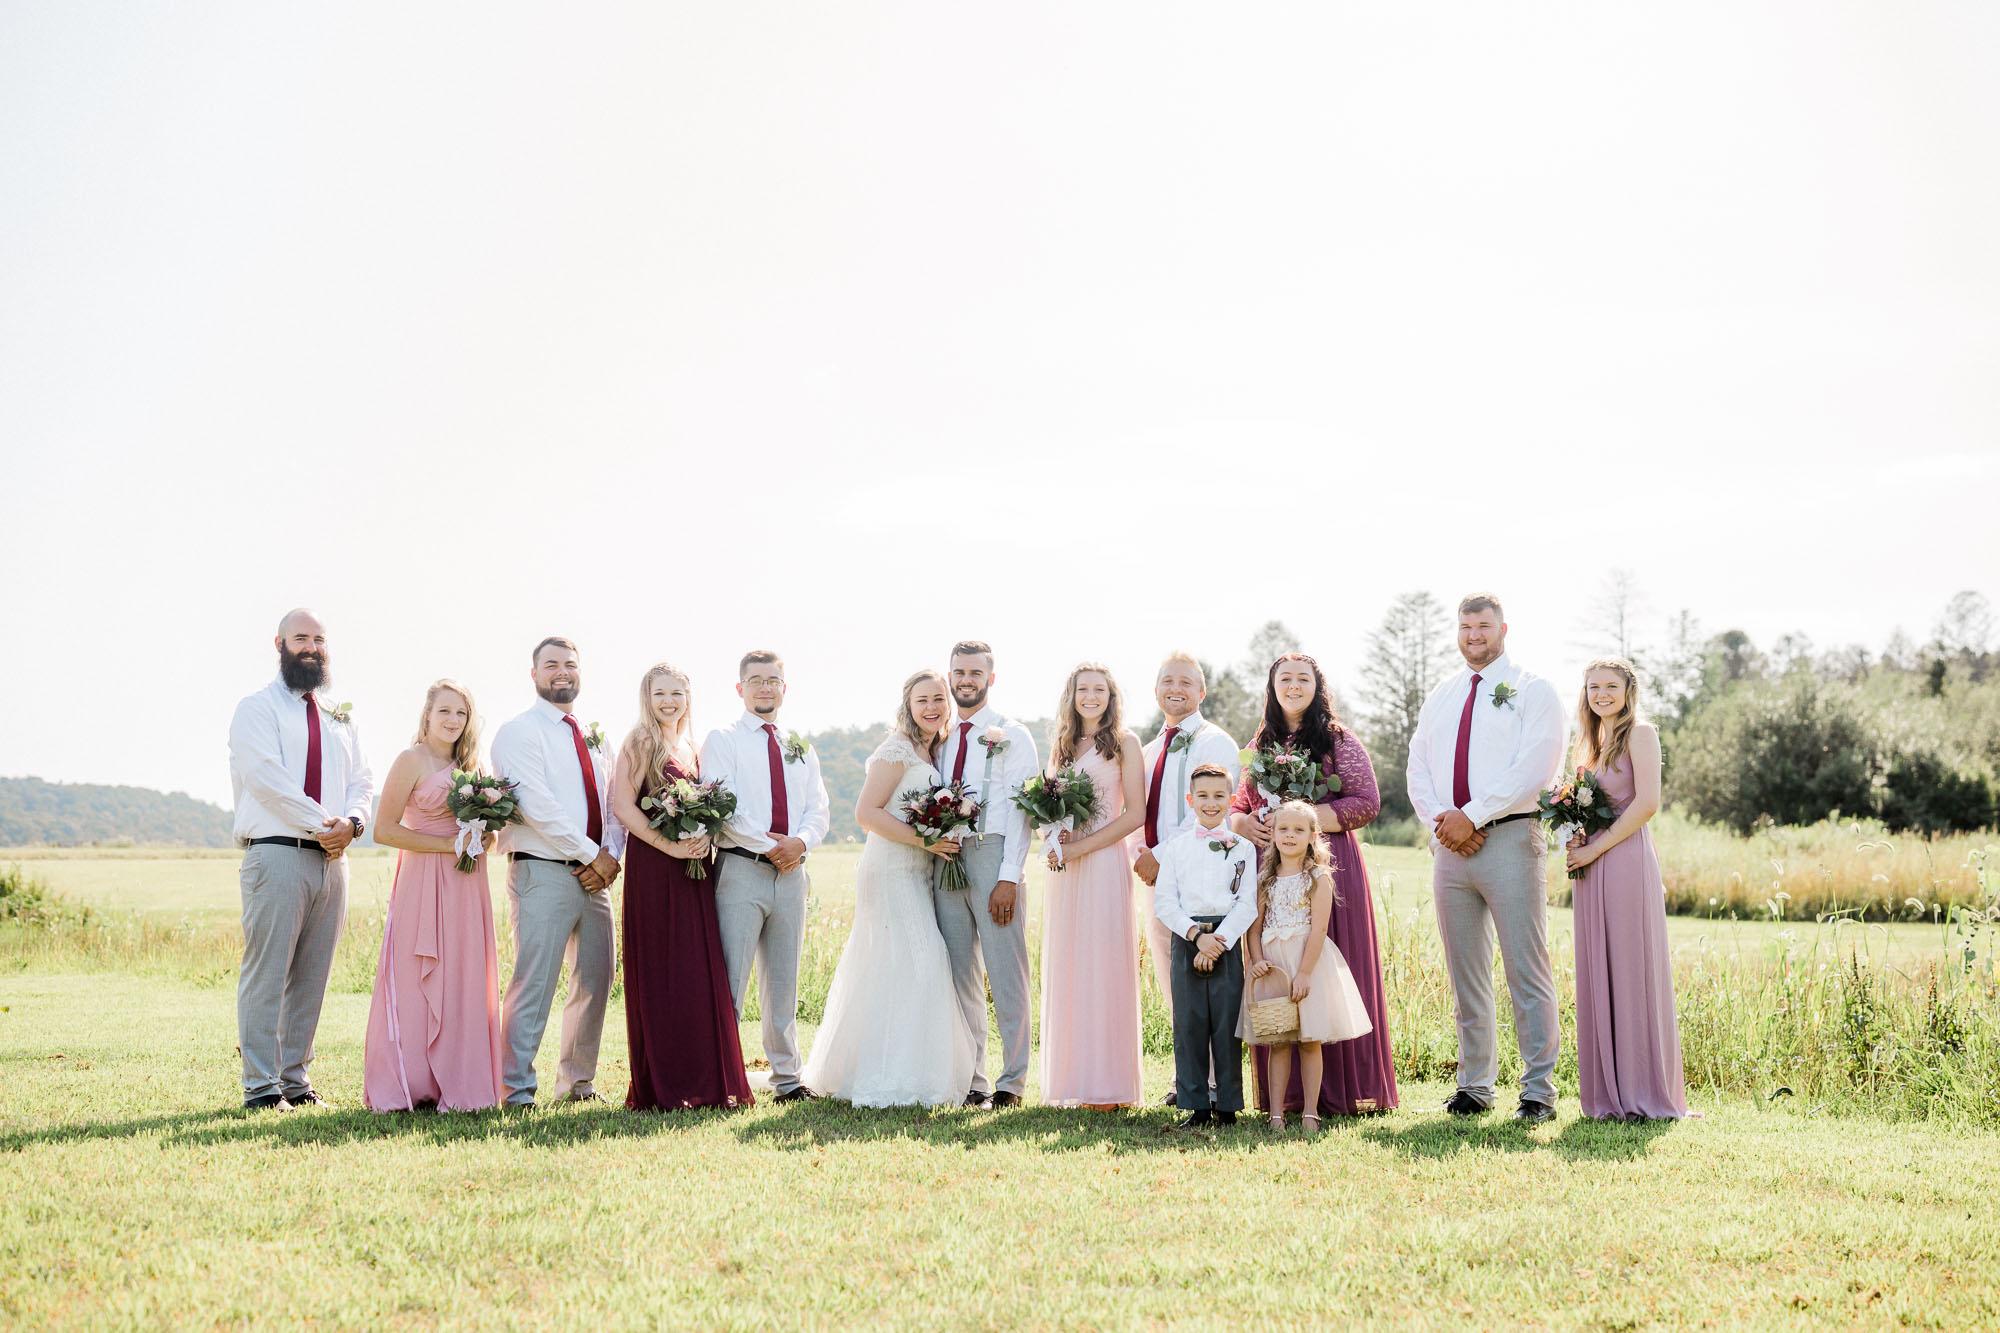 Stillwater-Christian_Church_Wedding-1809.jpg